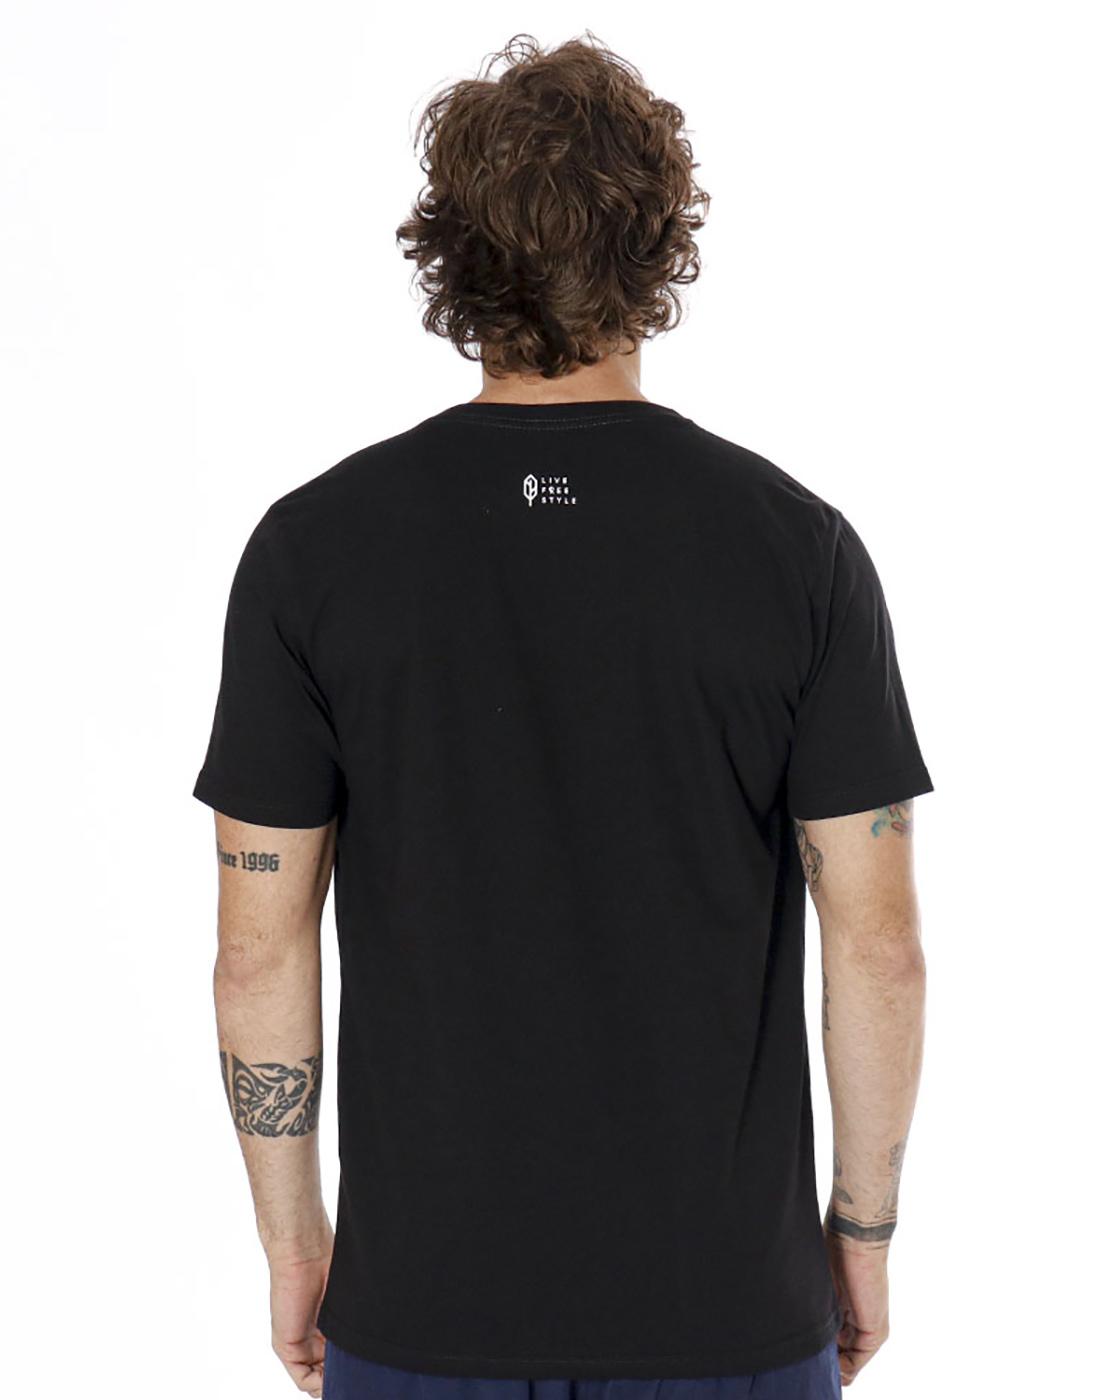 Camiseta Estampada Bob Marley Preto Pena